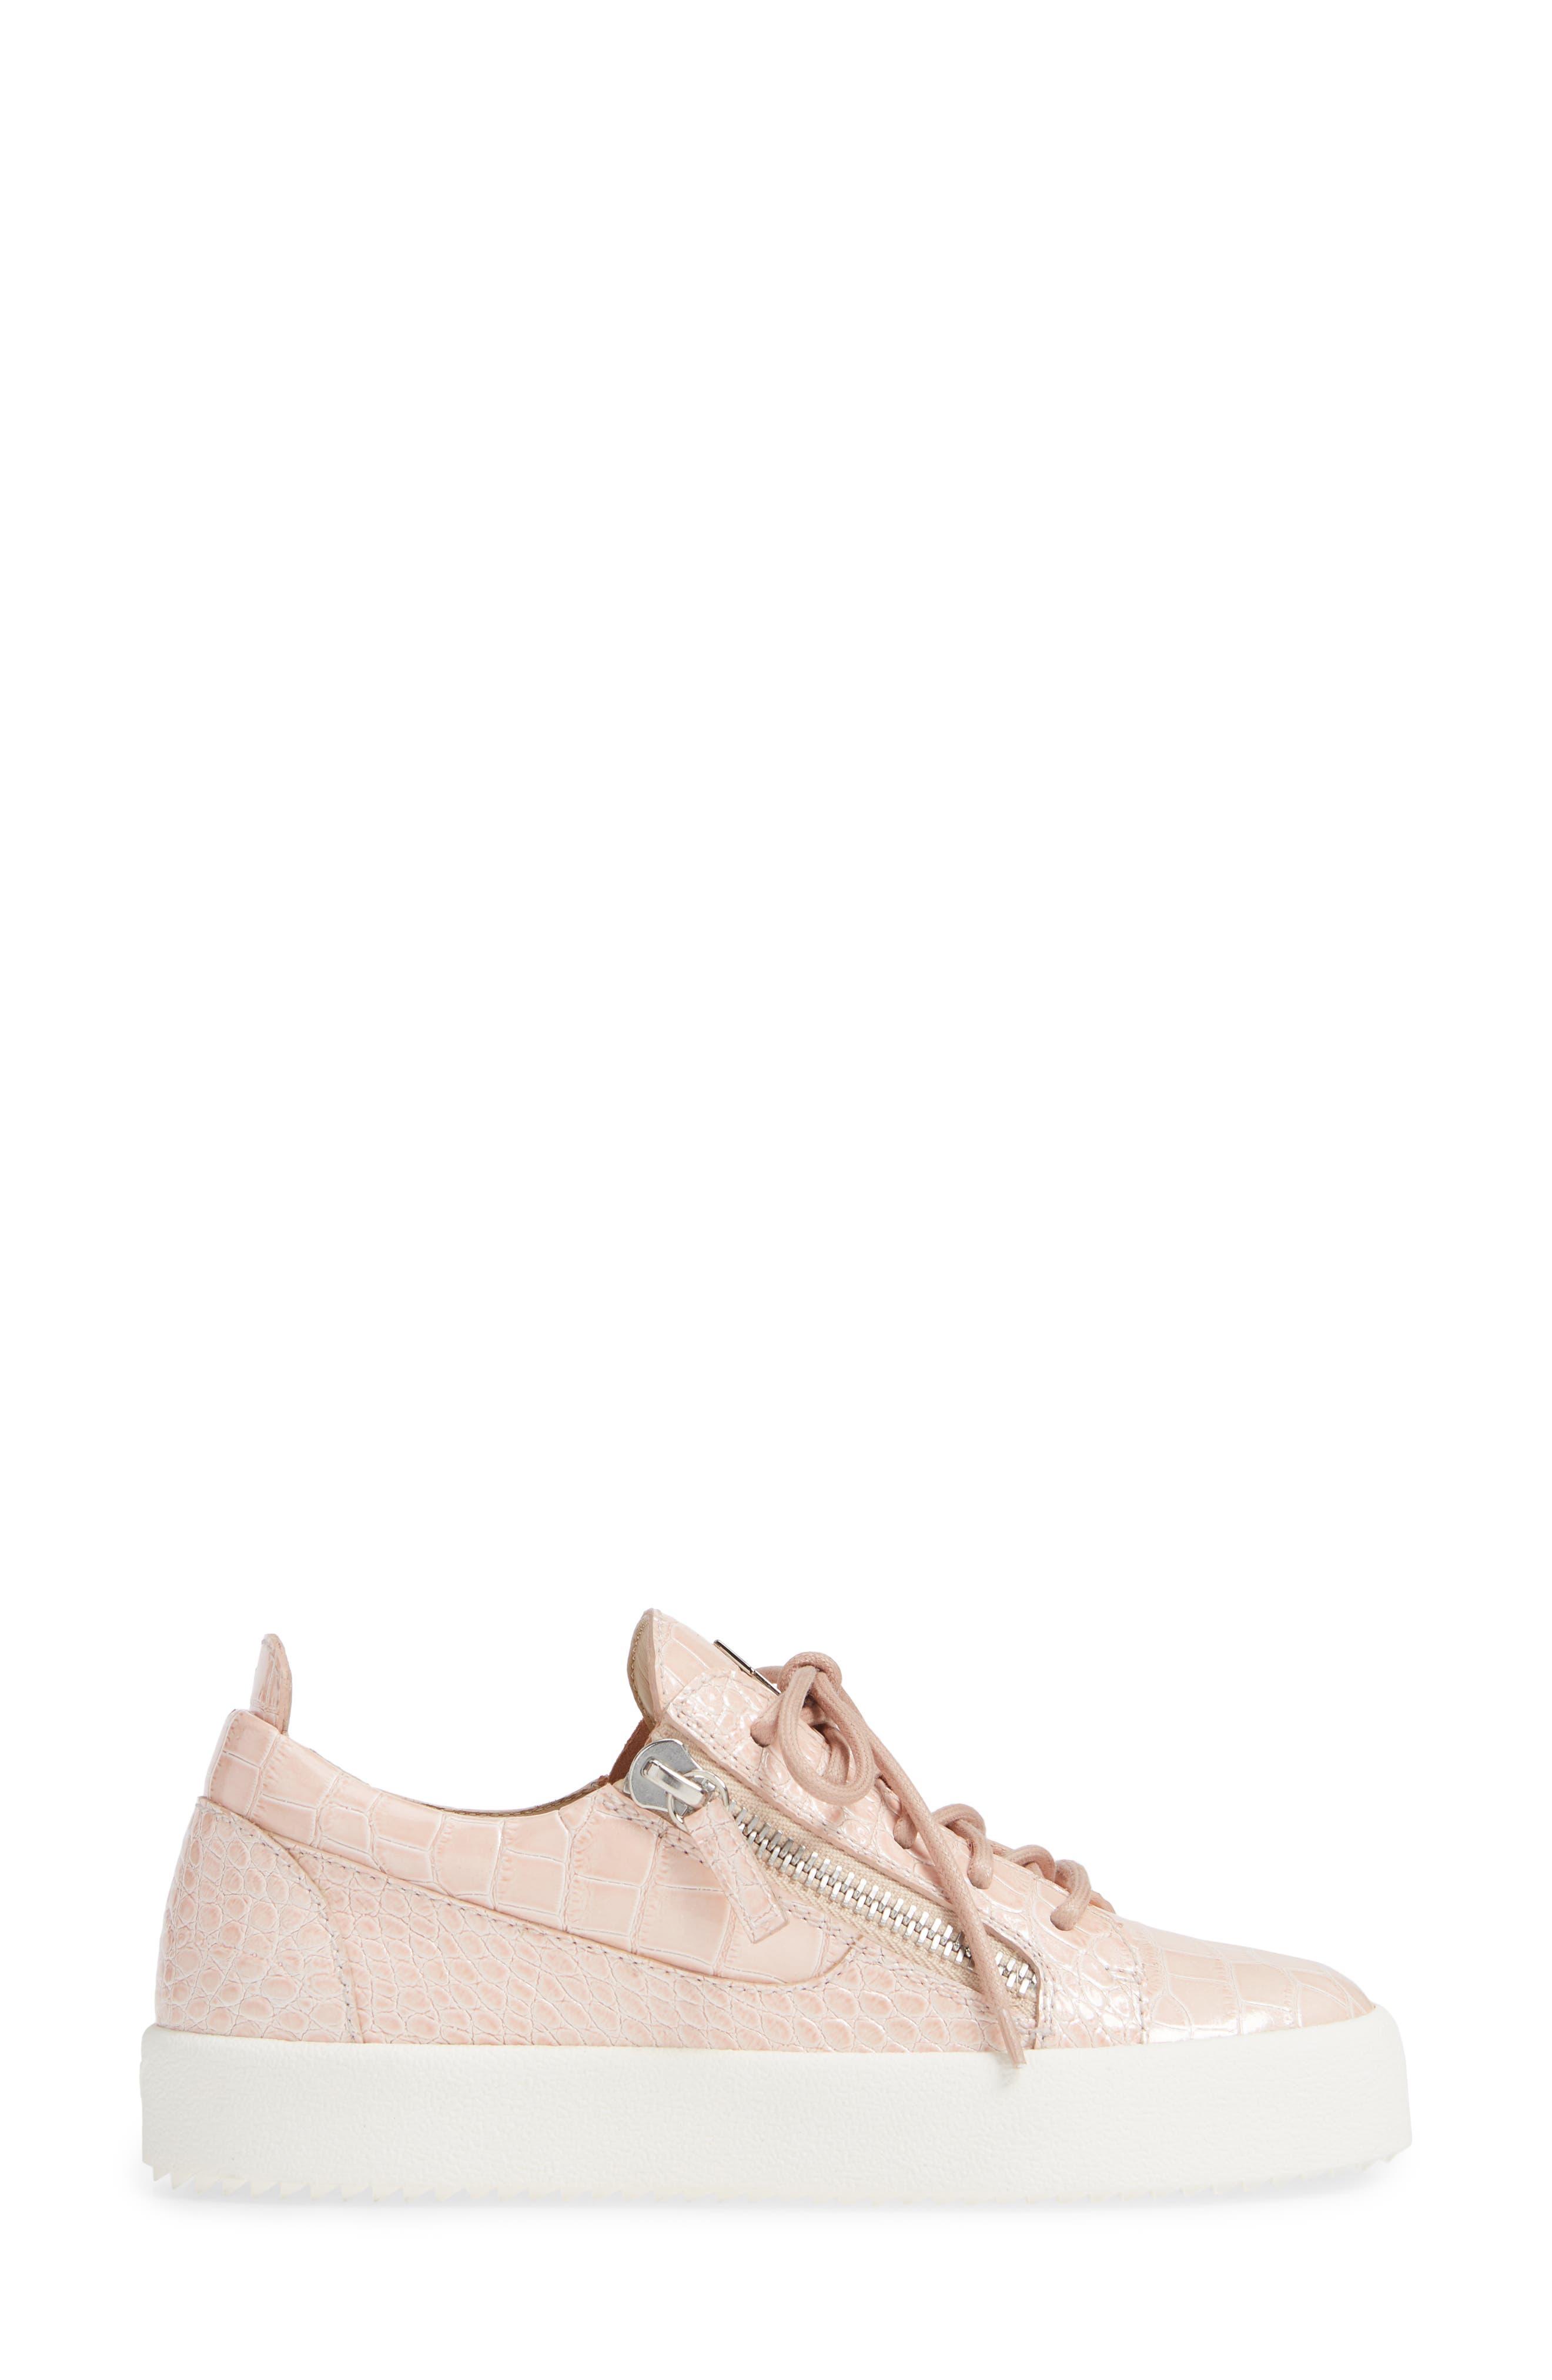 Low Top Sneaker,                             Alternate thumbnail 3, color,                             NUDE PINK